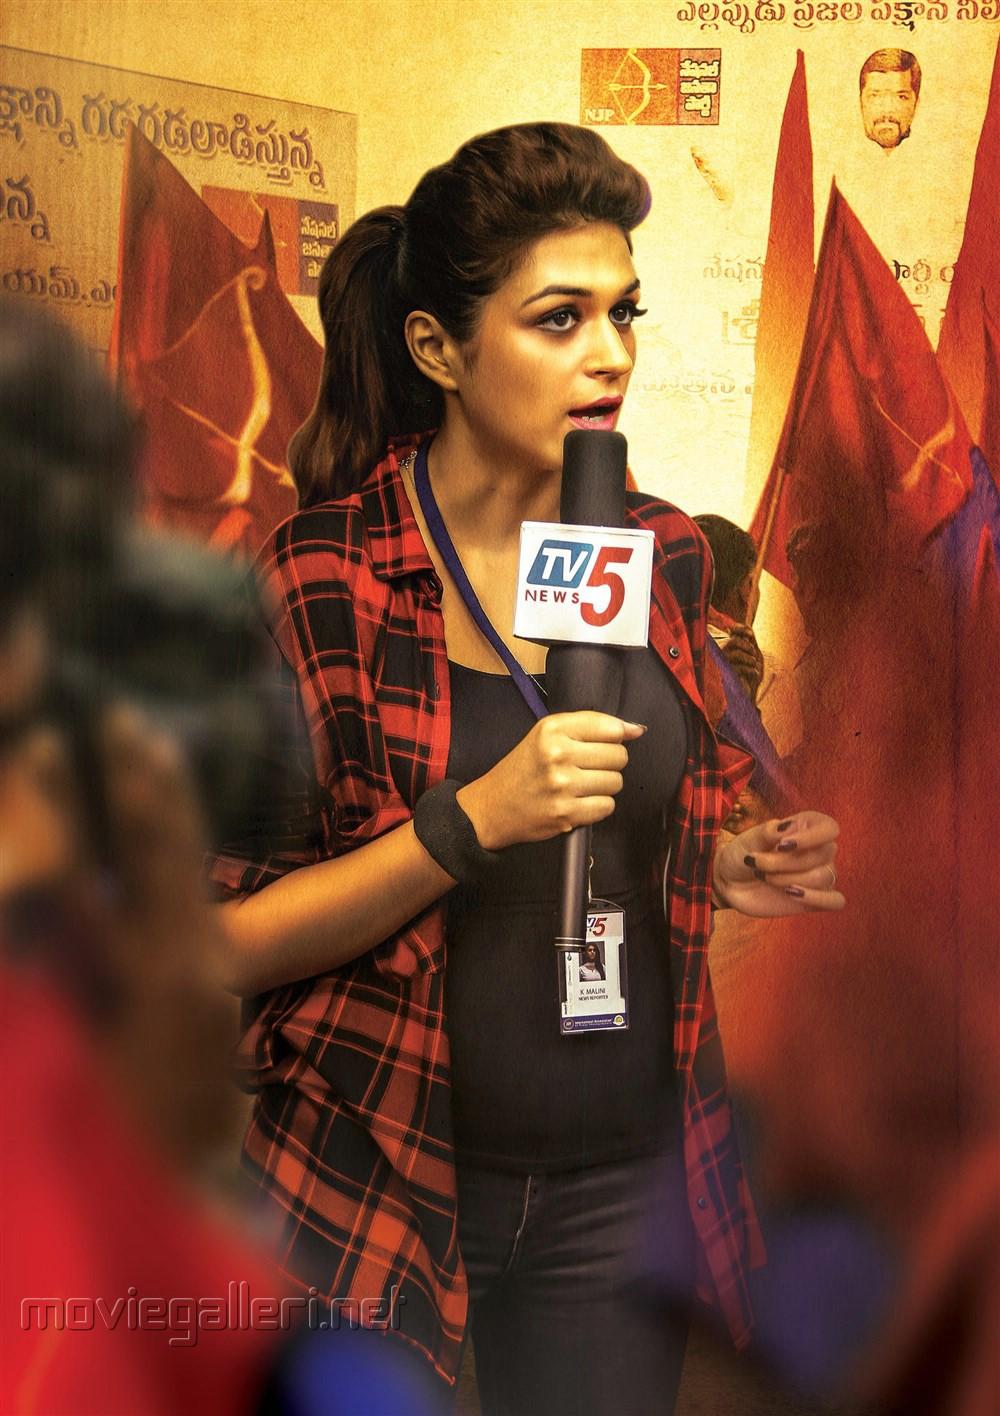 Actress Shraddha Das as Malini in PSV Garuda Vega Movie Images